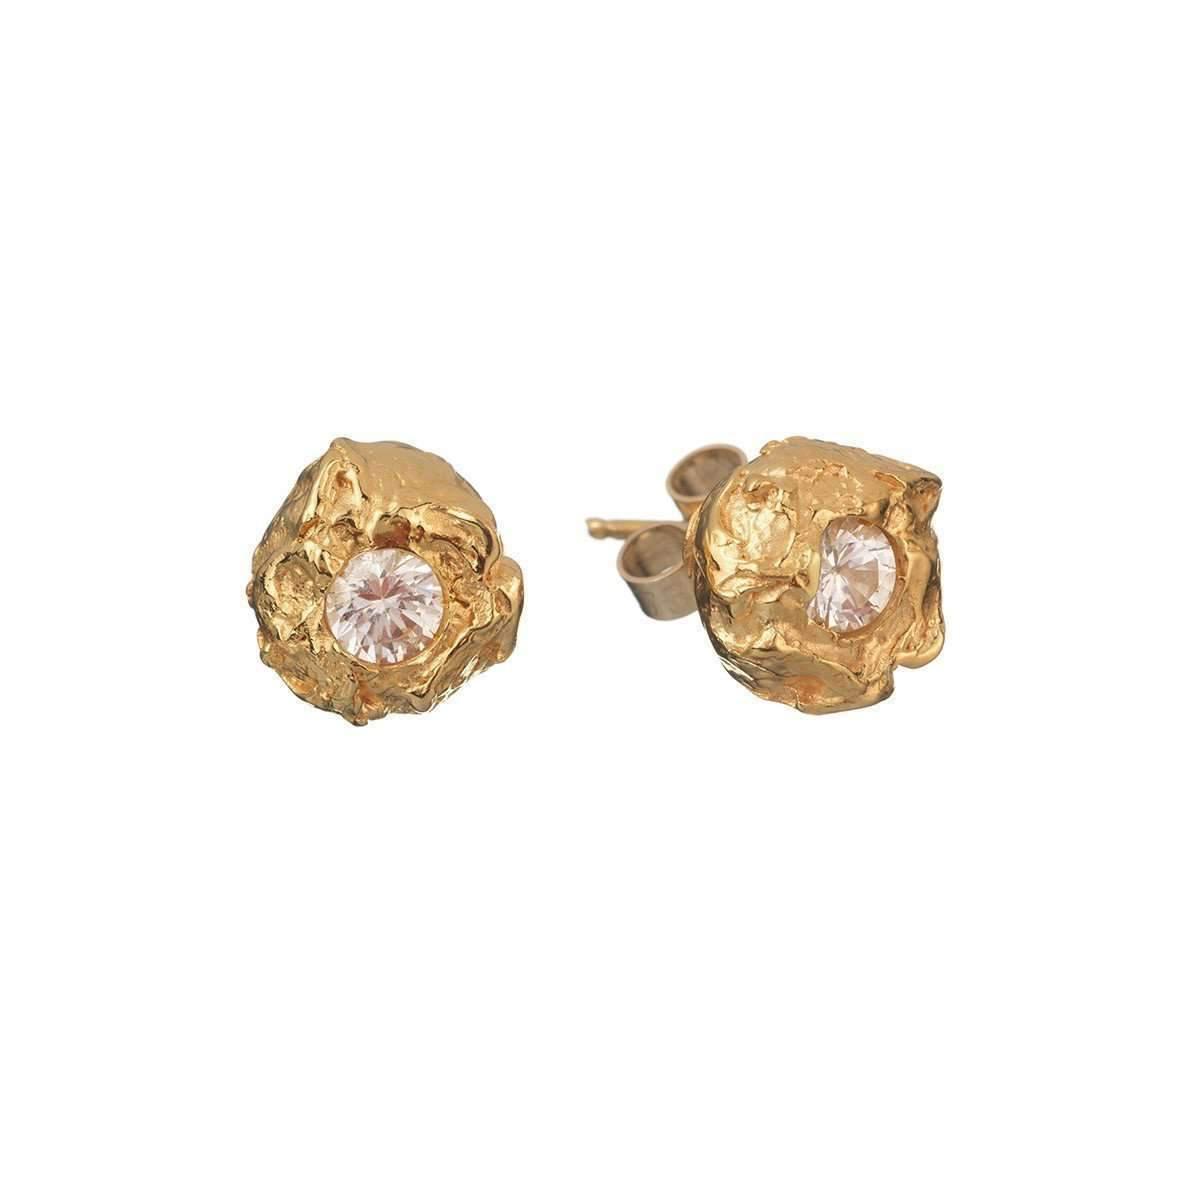 Deborah Blyth Jewellery Lula White Sapphire Stud Earrings egMwLCWTJ